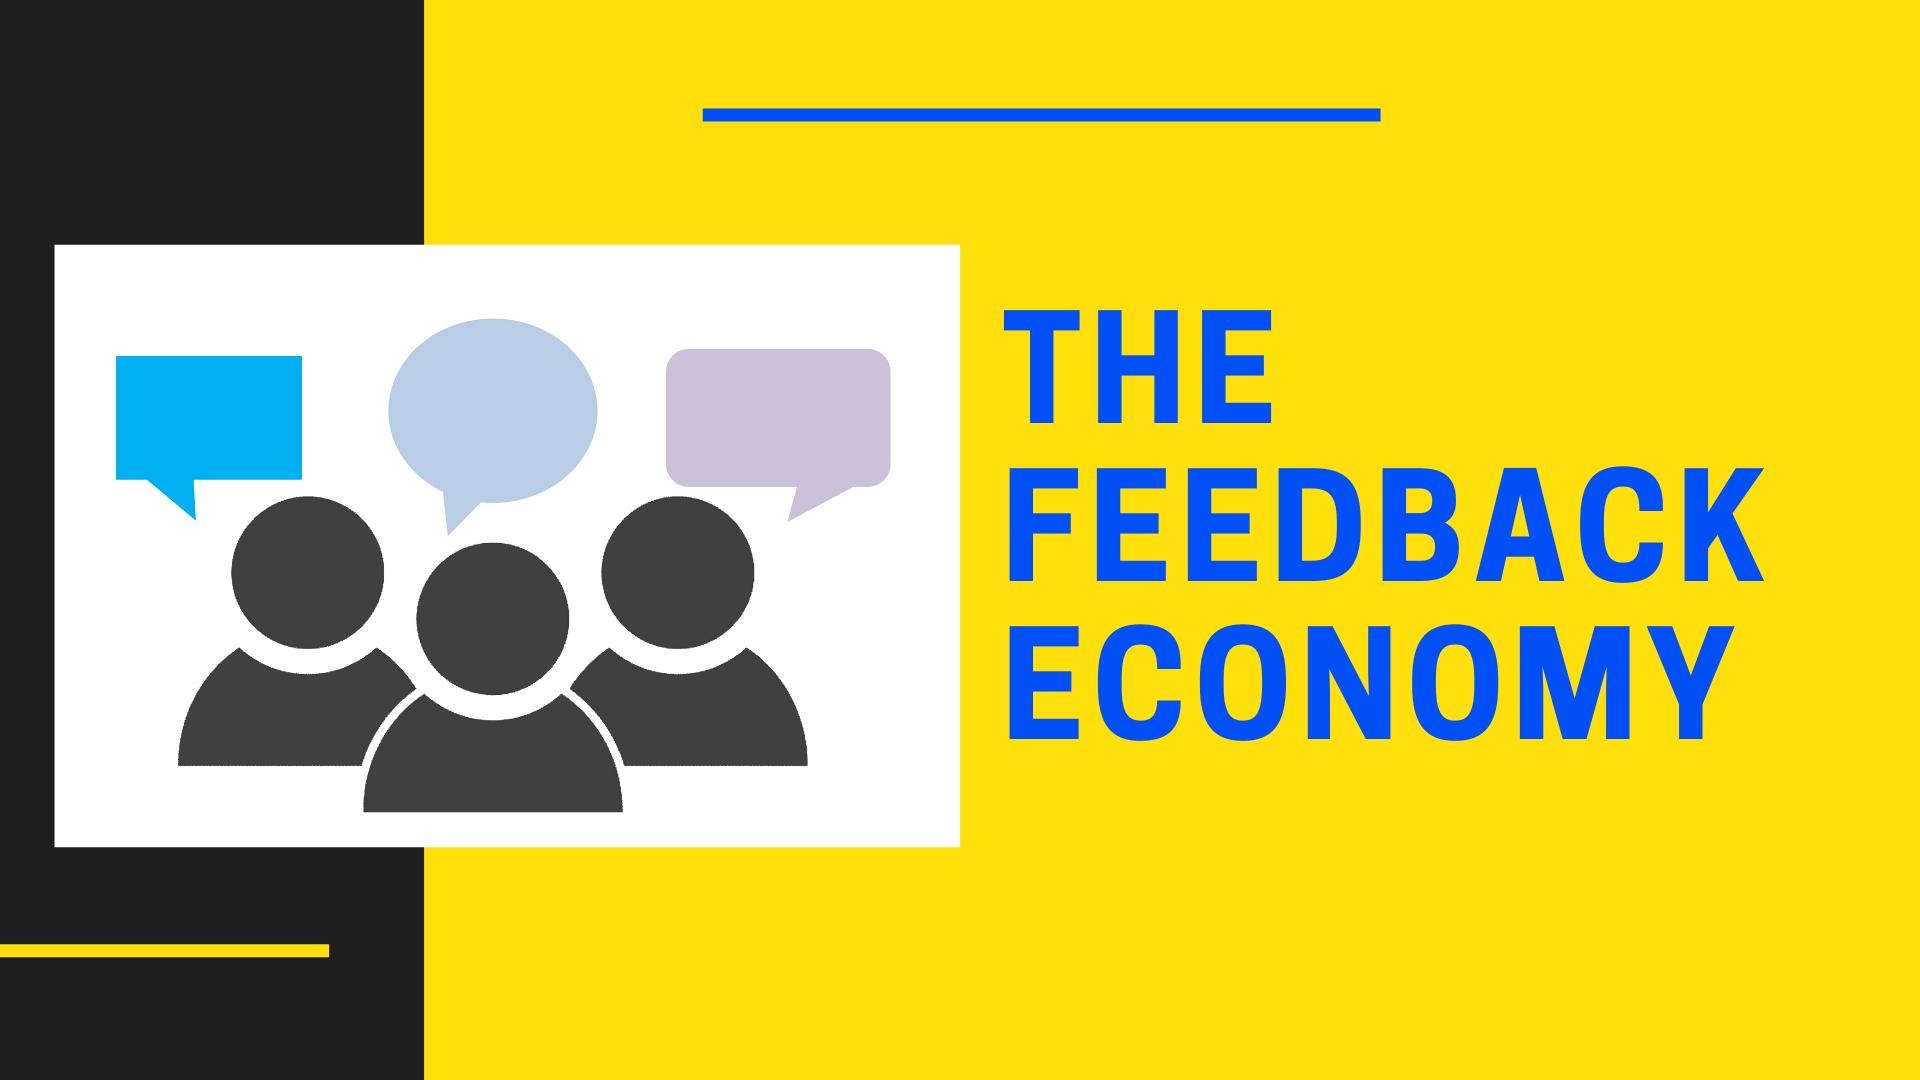 the feedback economy